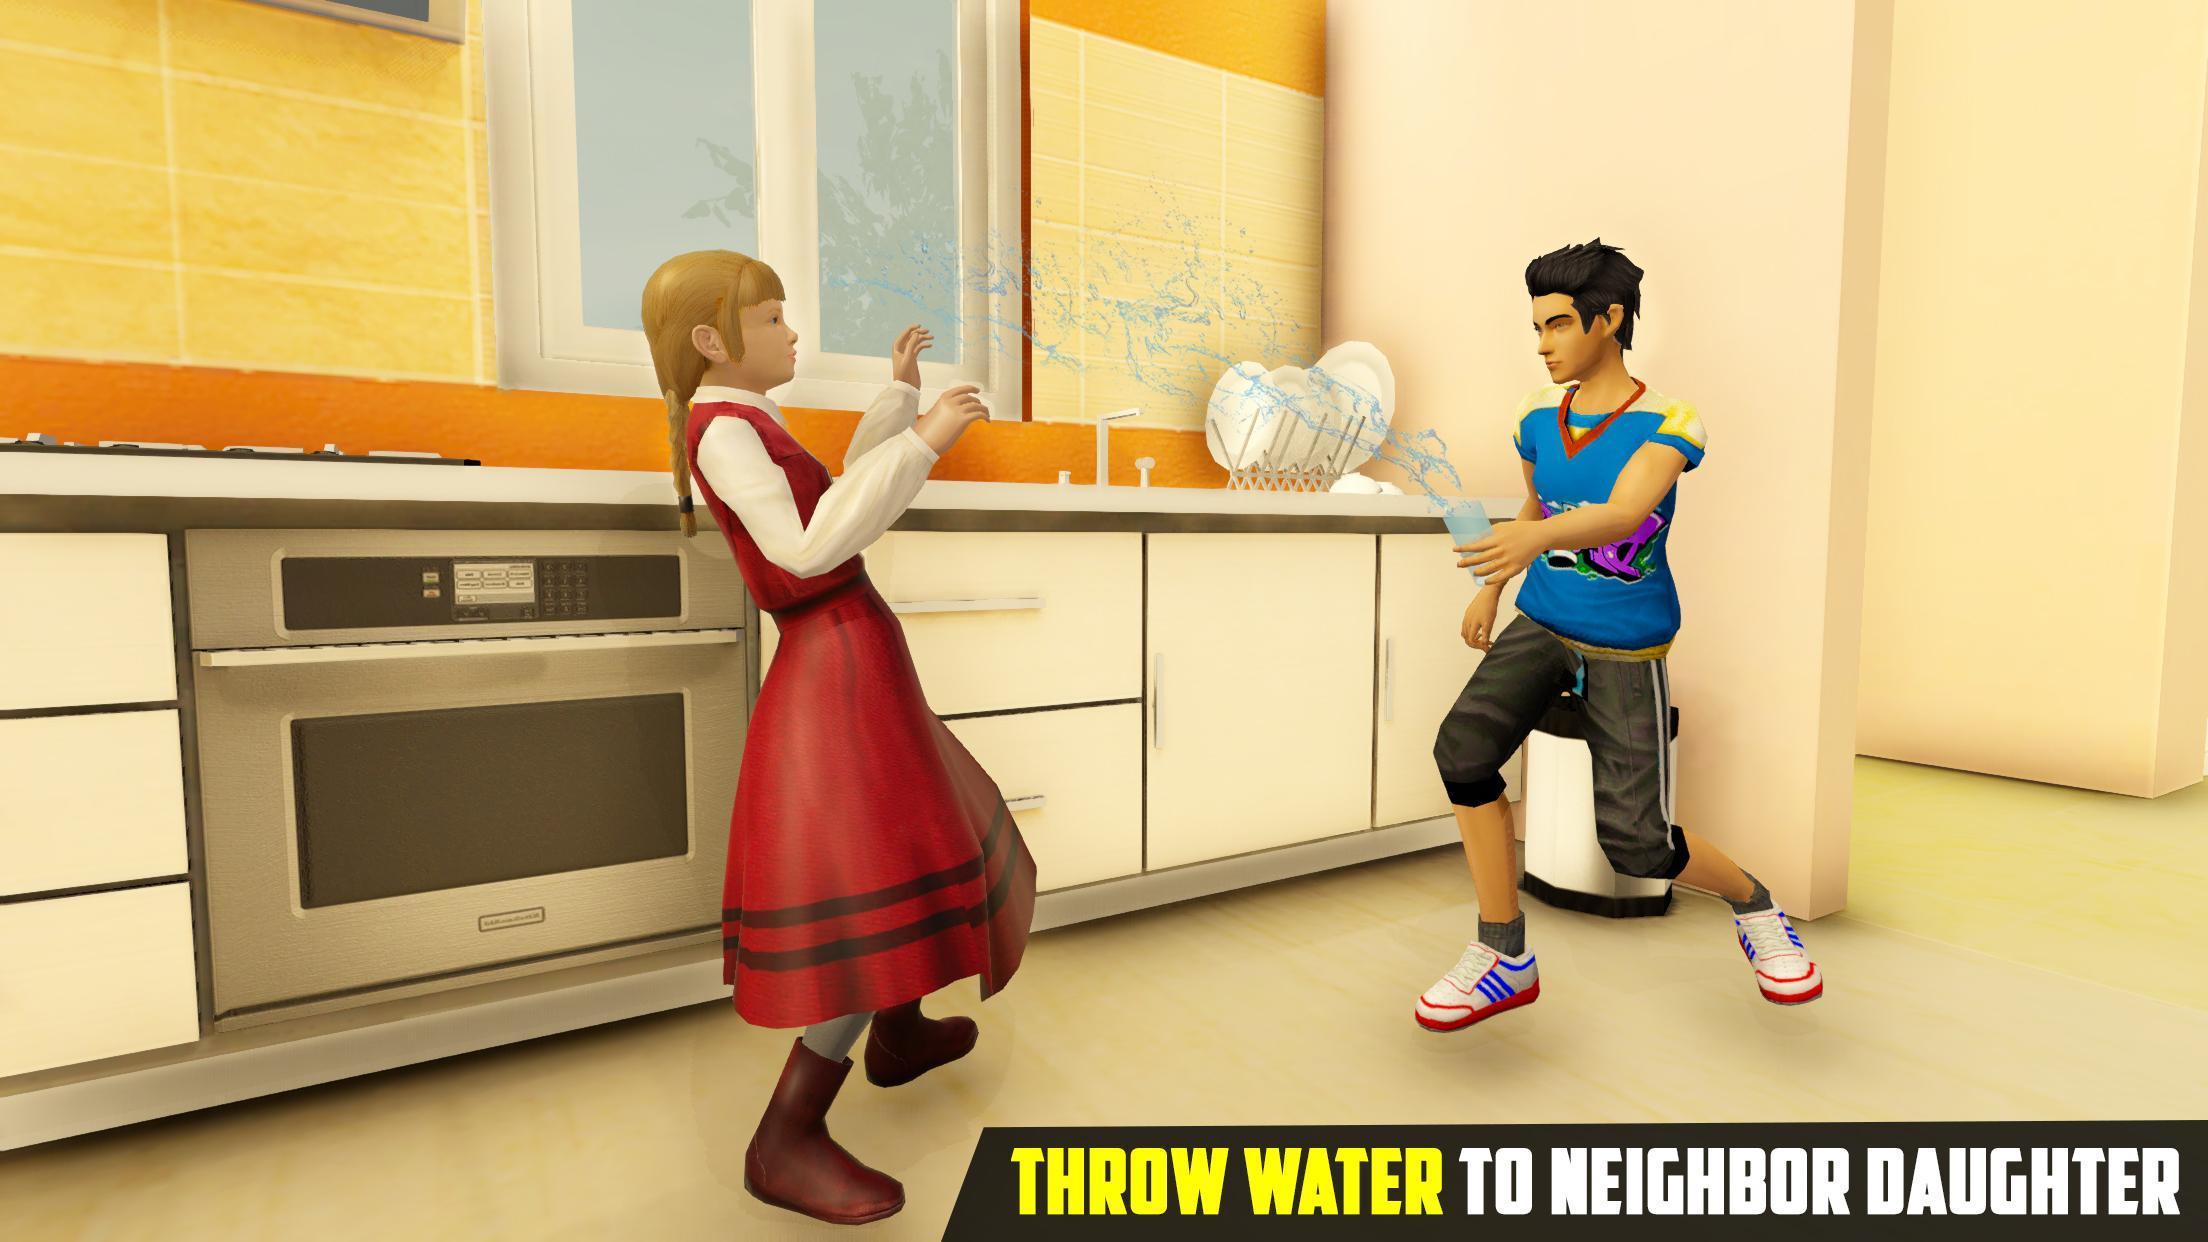 Virtual Bully Boys Next Angry Neighbor 1.4 Screenshot 3